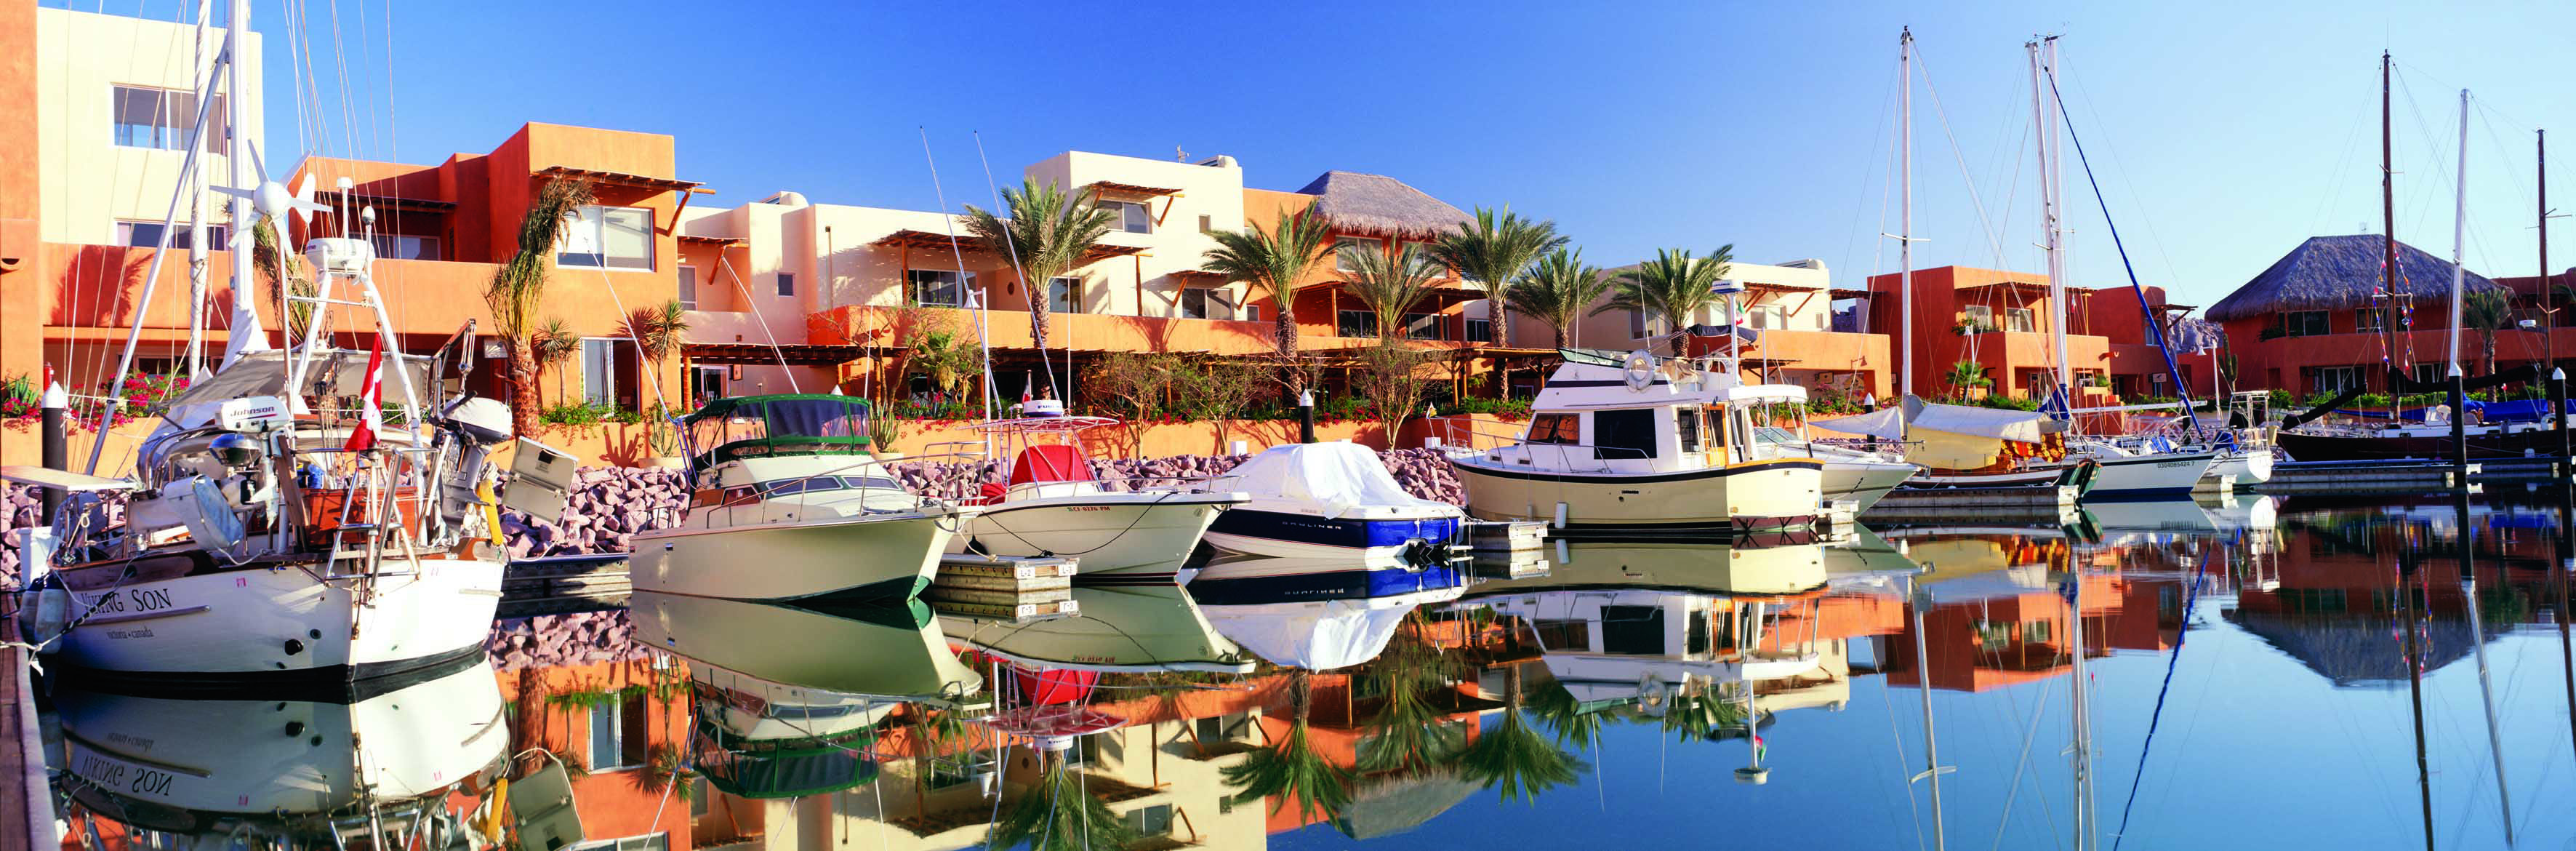 Hotel Marina La Paz Baja